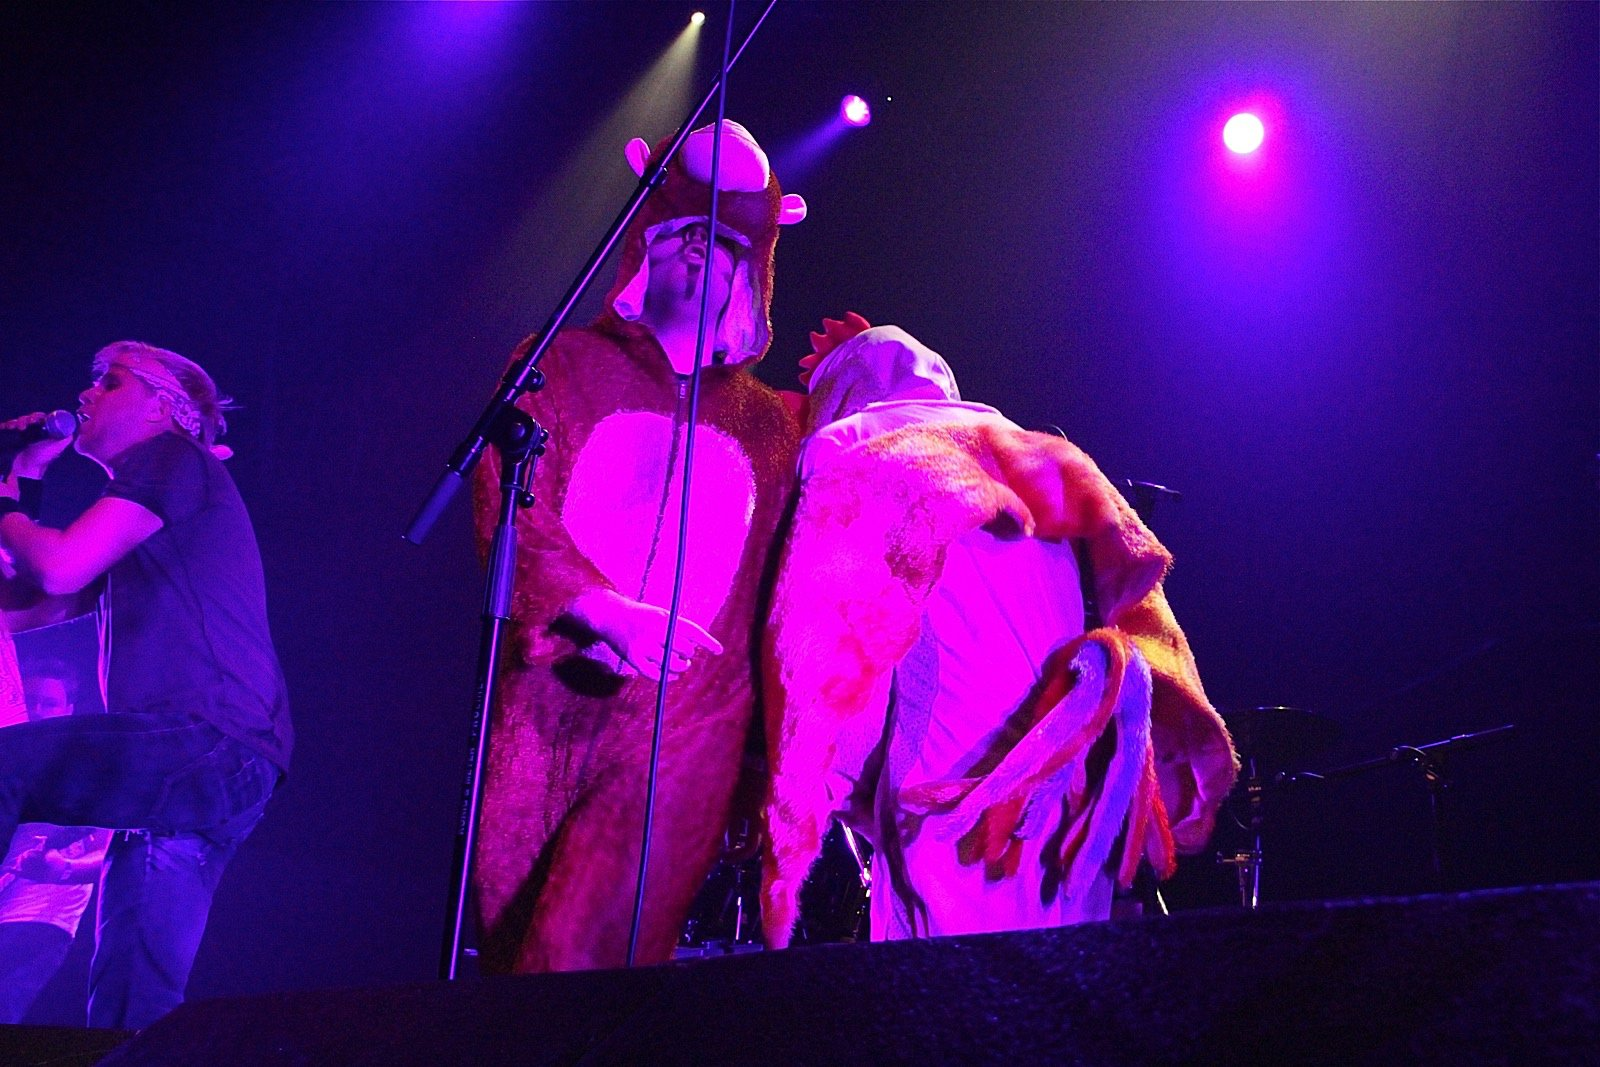 An Assfull Of Love - Rockhal Esch-sur-Alzette, 19.11.2011 (Support für J.B.O.) - Foto von Andrea Jaeckel-Dobschat - 146